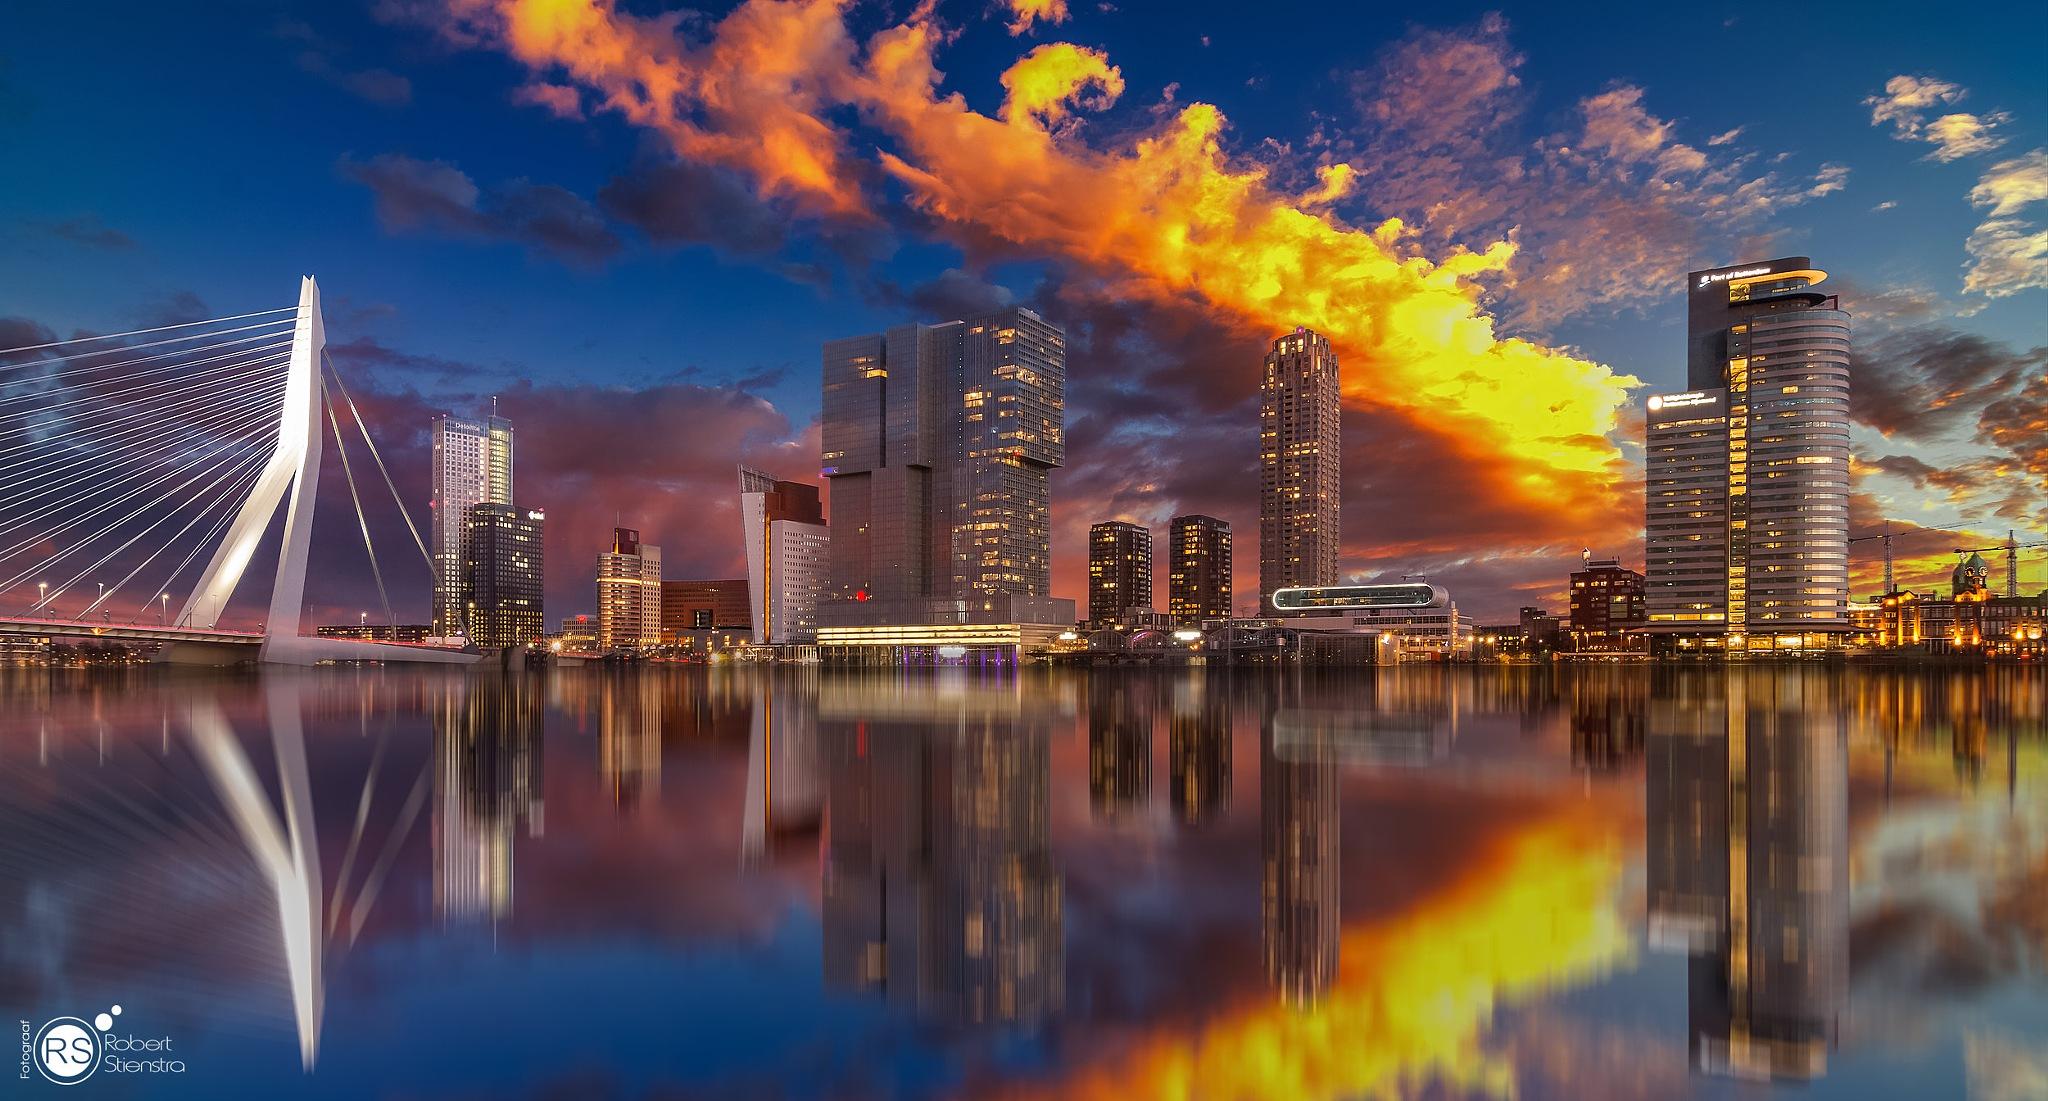 Rotterdam skyline (on fire) by Robert Stienstra